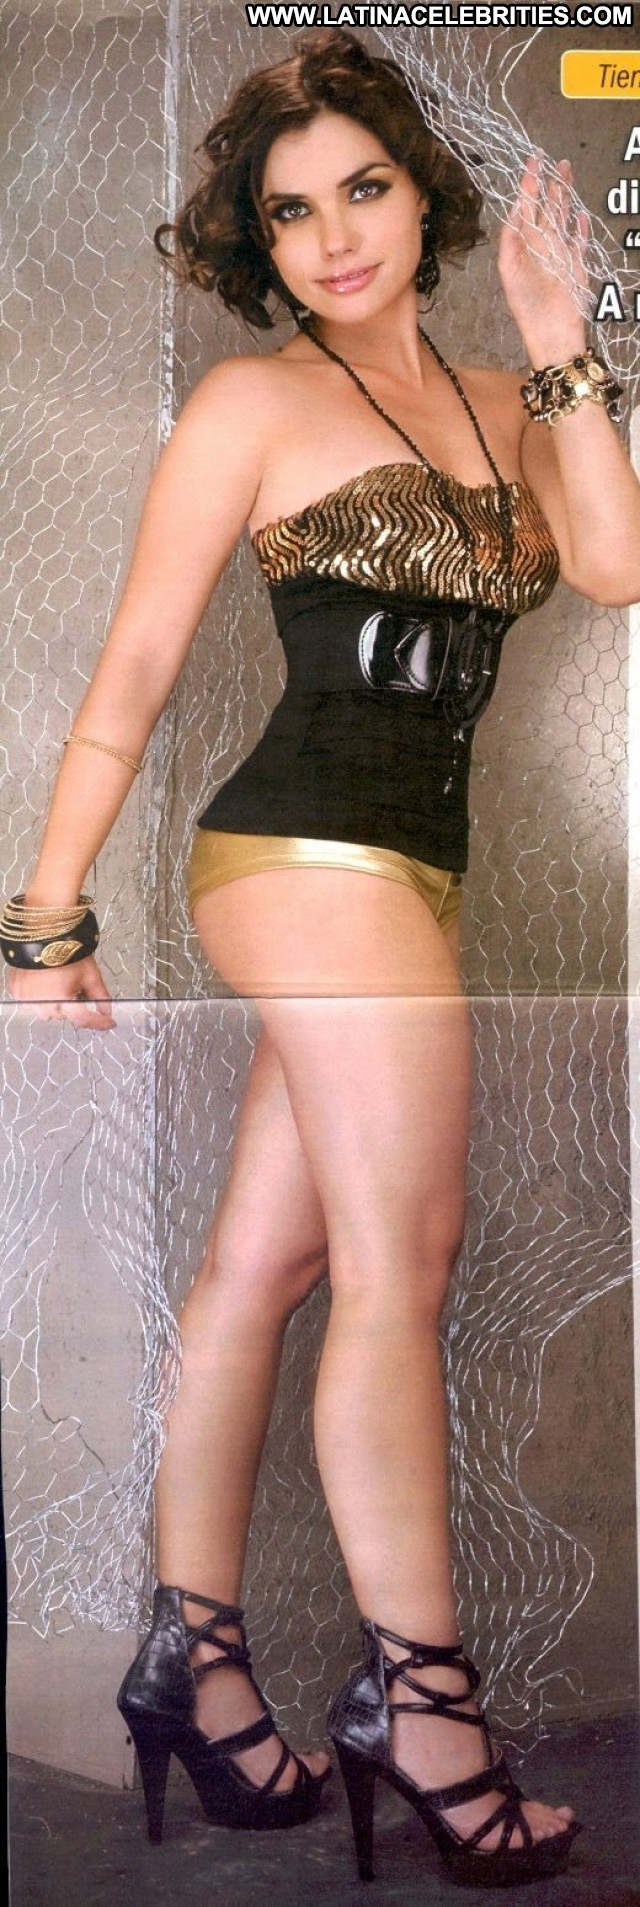 Viviana Sada Miscellaneous Nice Blonde Latina Sensual Cute Pretty